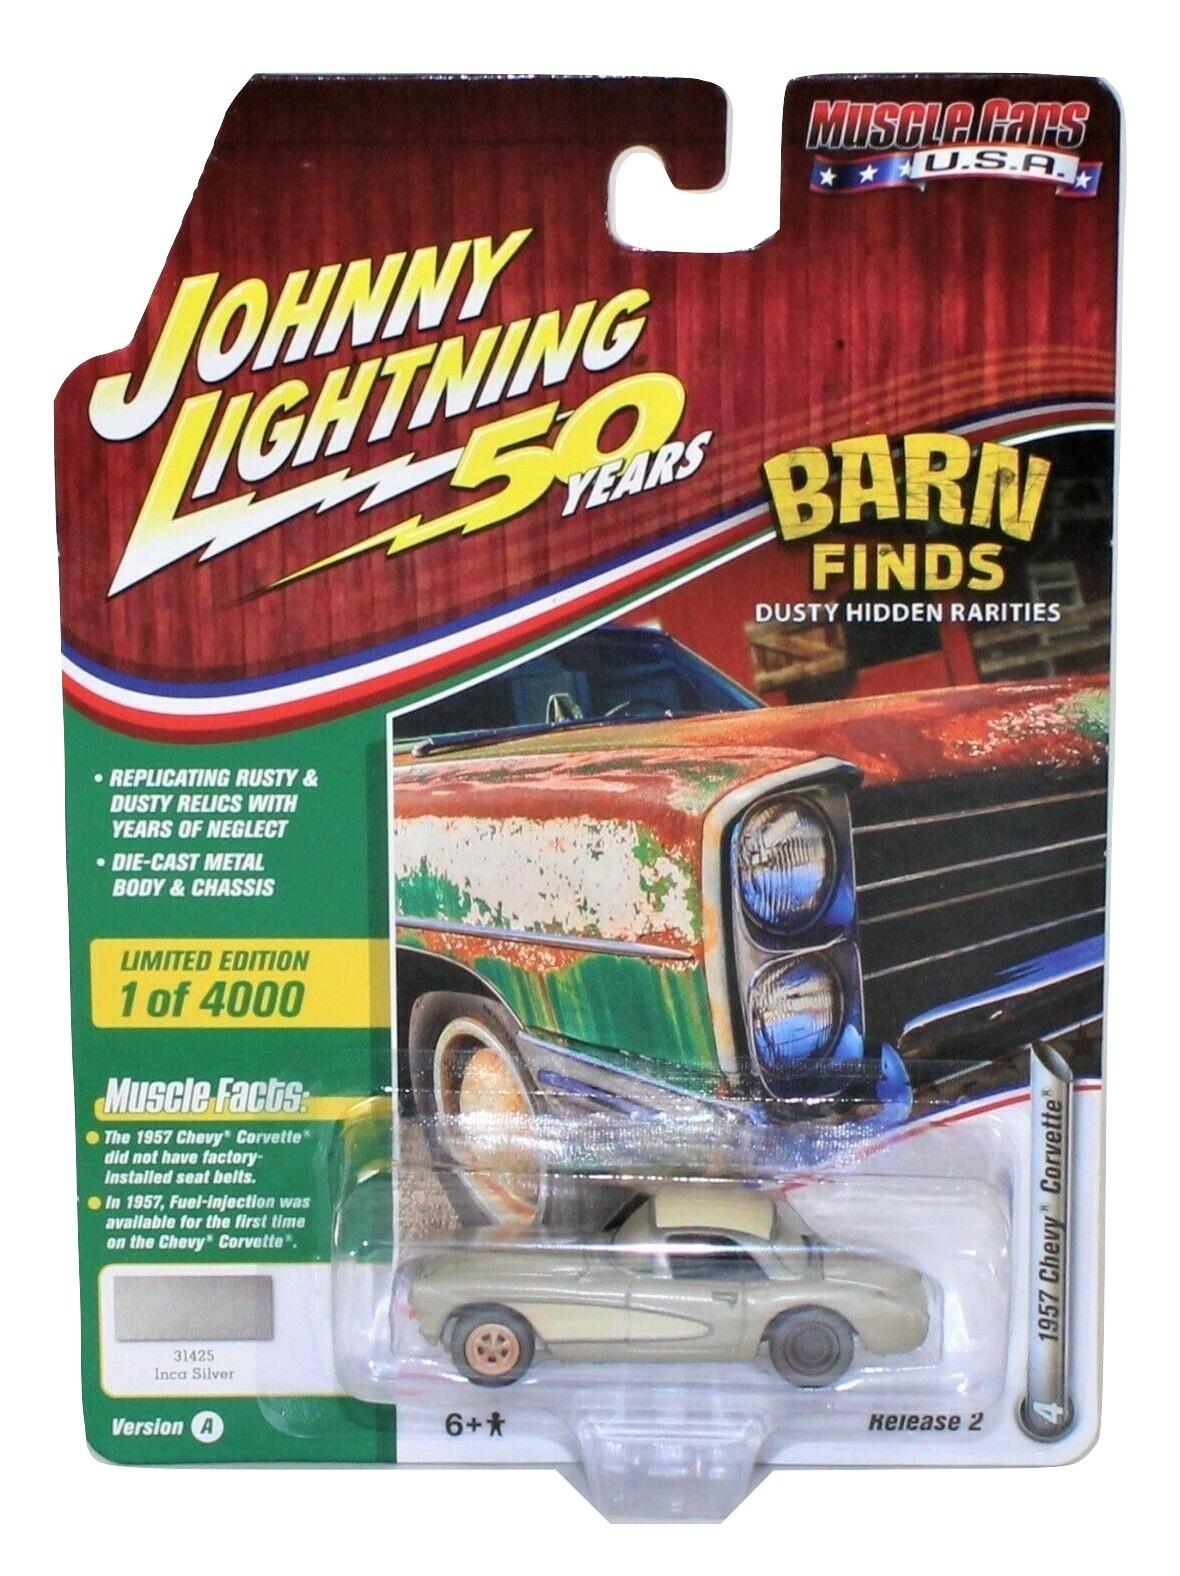 Silver Johnny Lightning 1998 Corvette Convertible Corvette Collection